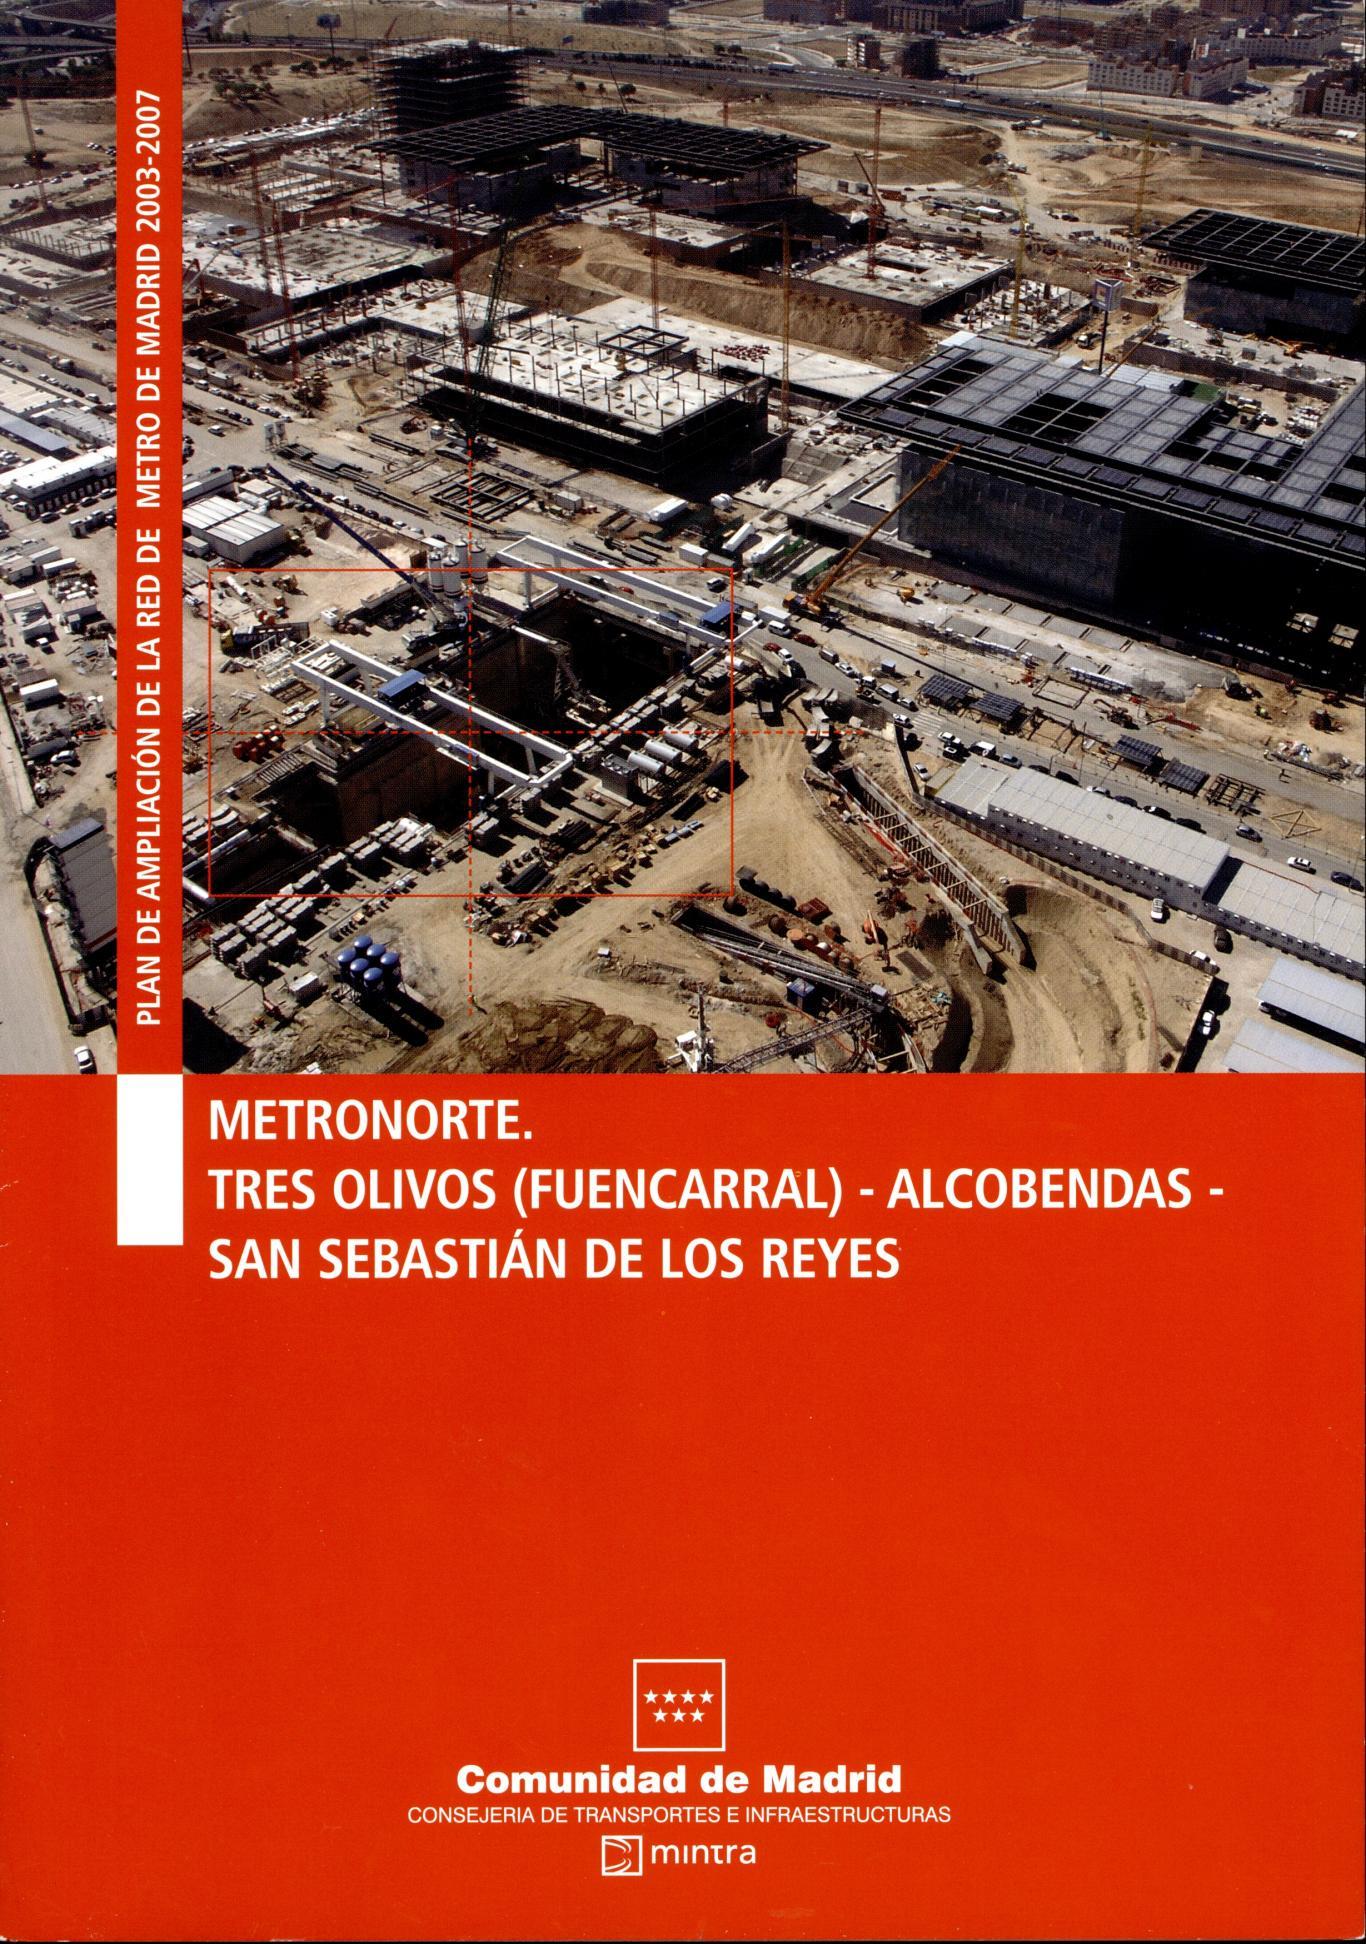 Carátula folleto Metronorte